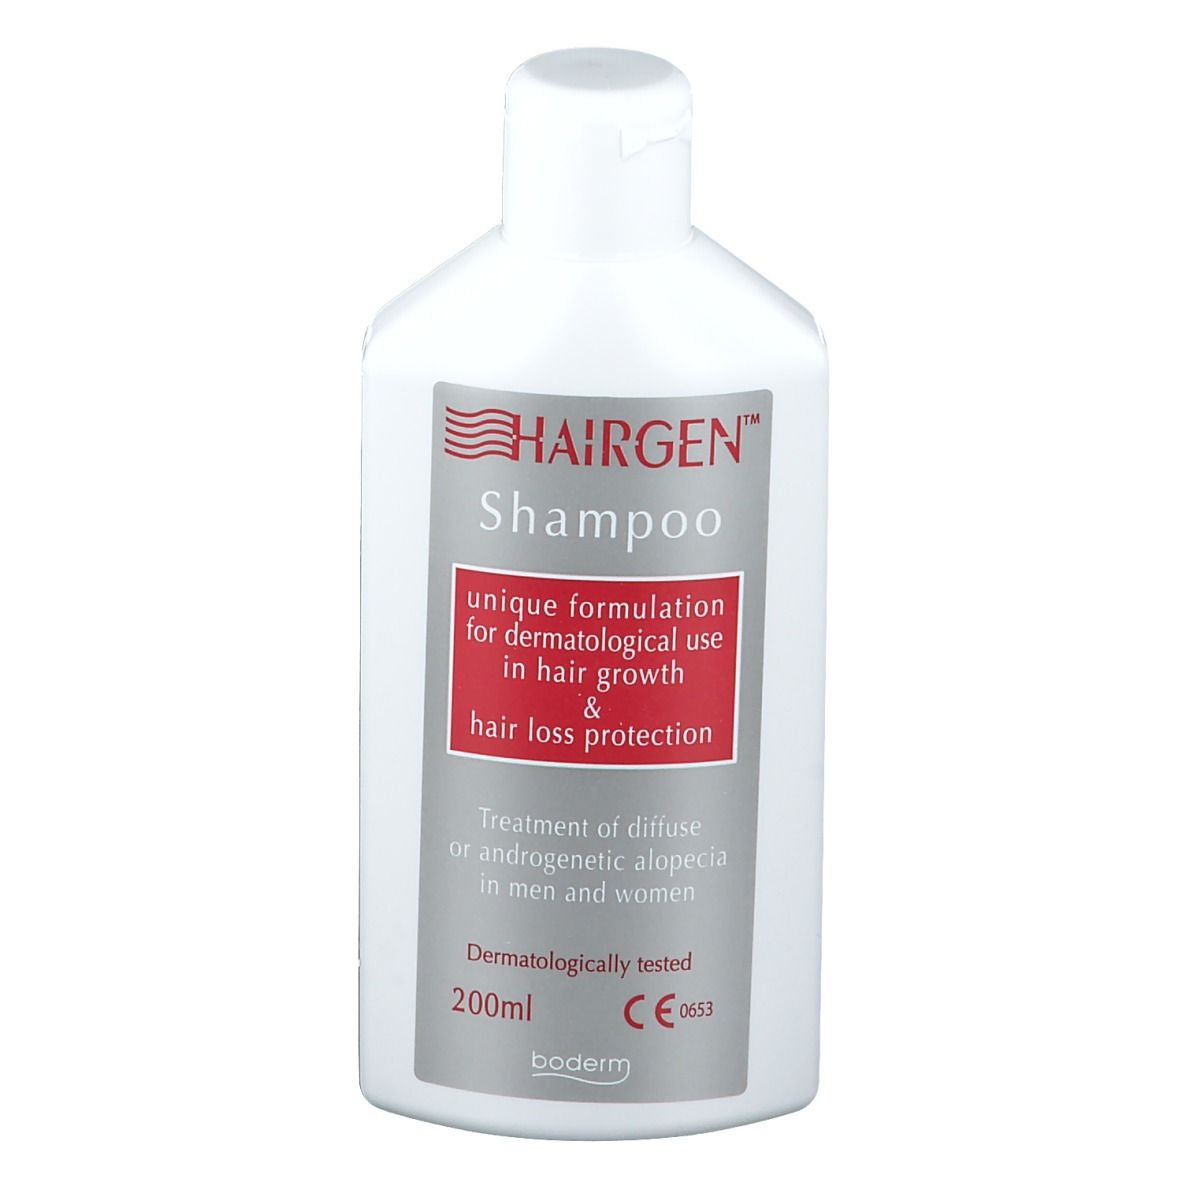 HAIRGEN Shampoo